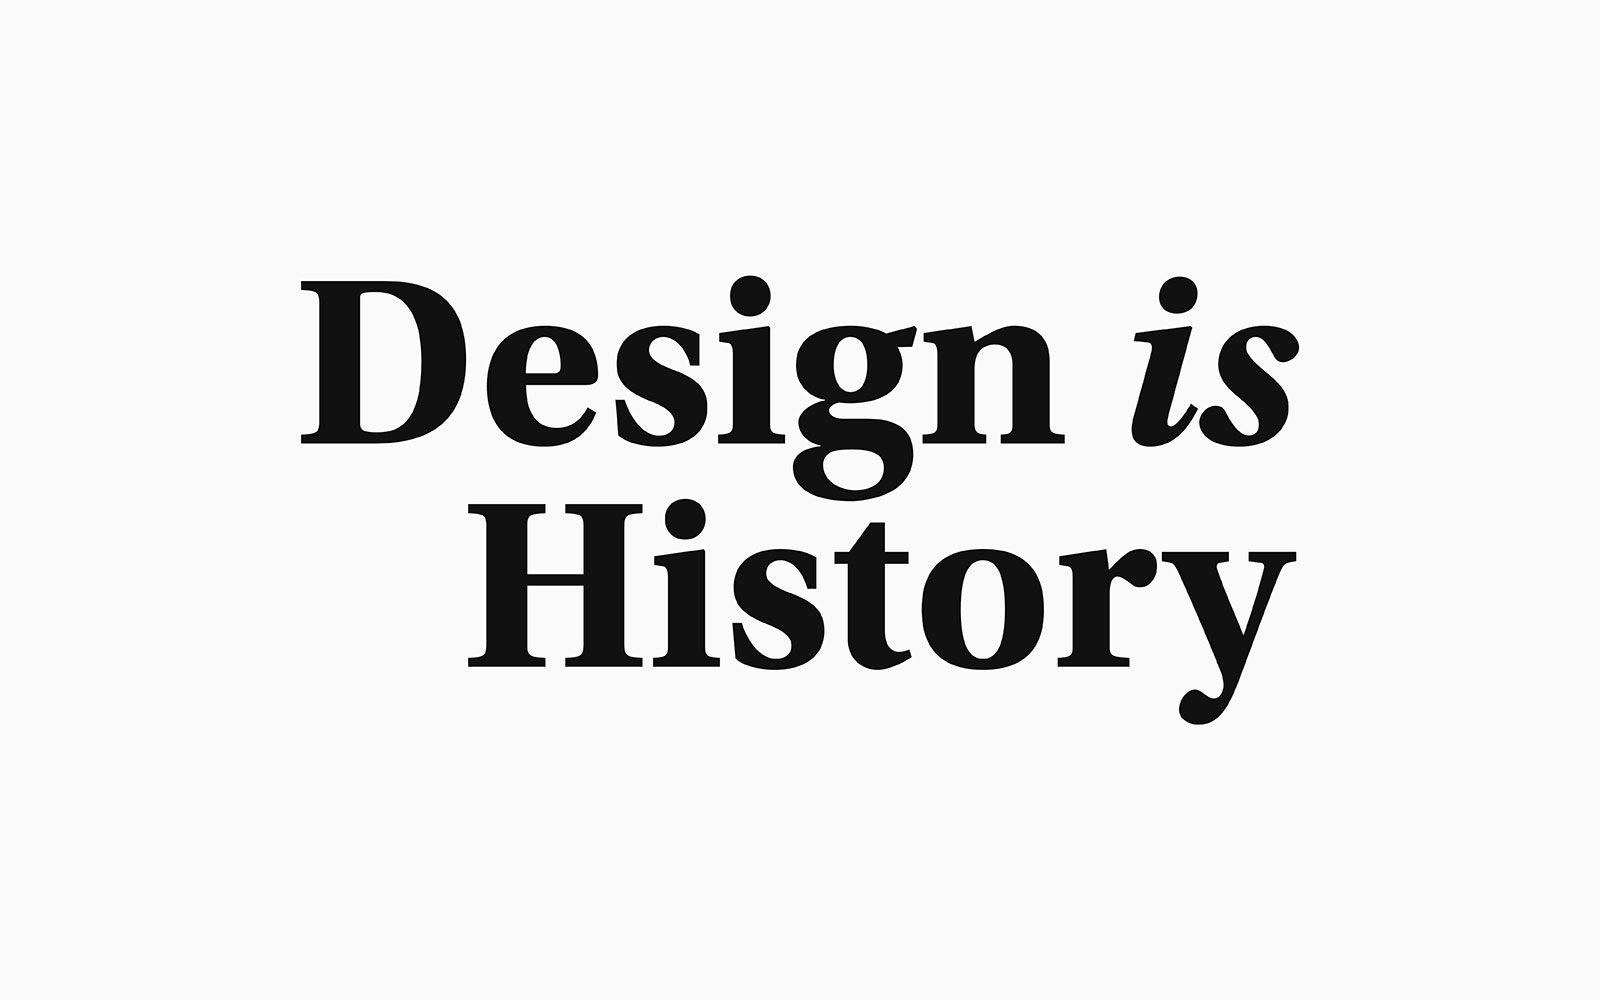 Design is History